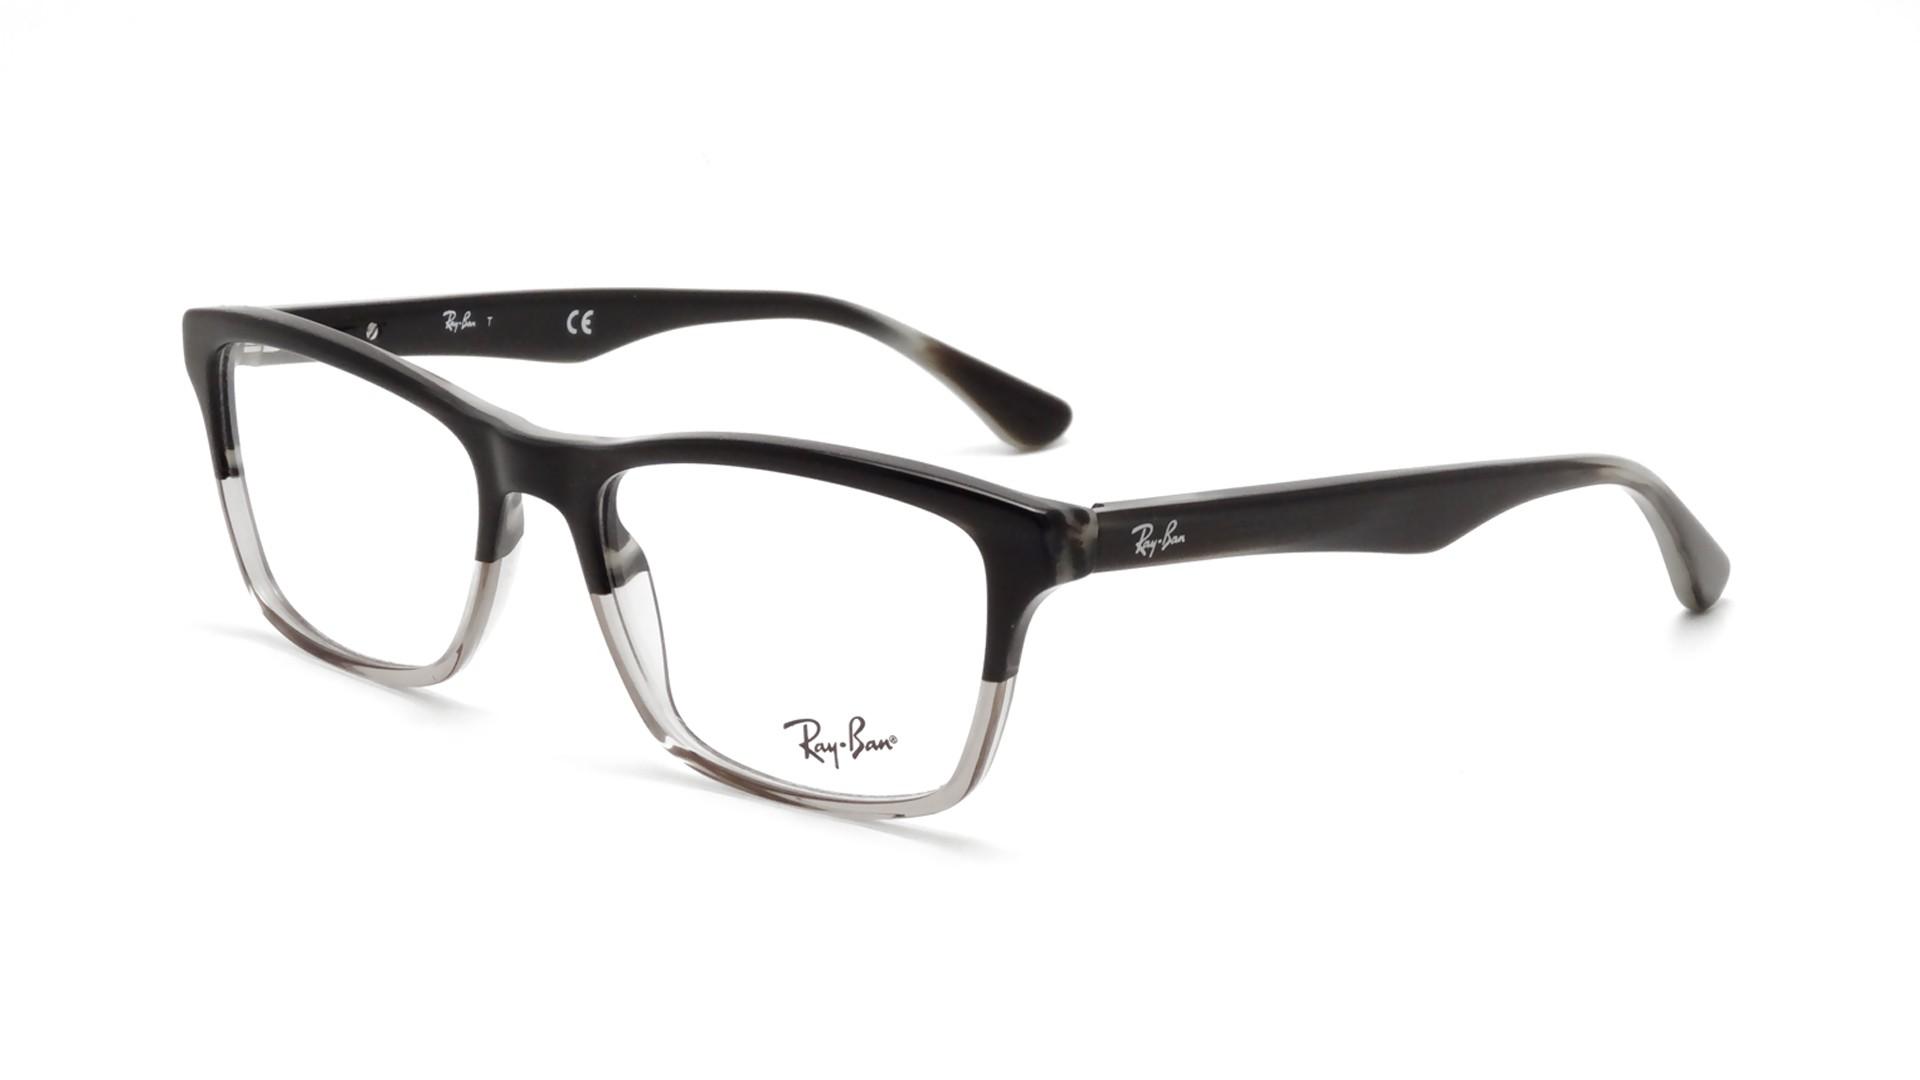 4d98e6ff60 Eyeglasses Ray-Ban RX5279 RB5279 5540 55-18 Grey Medium